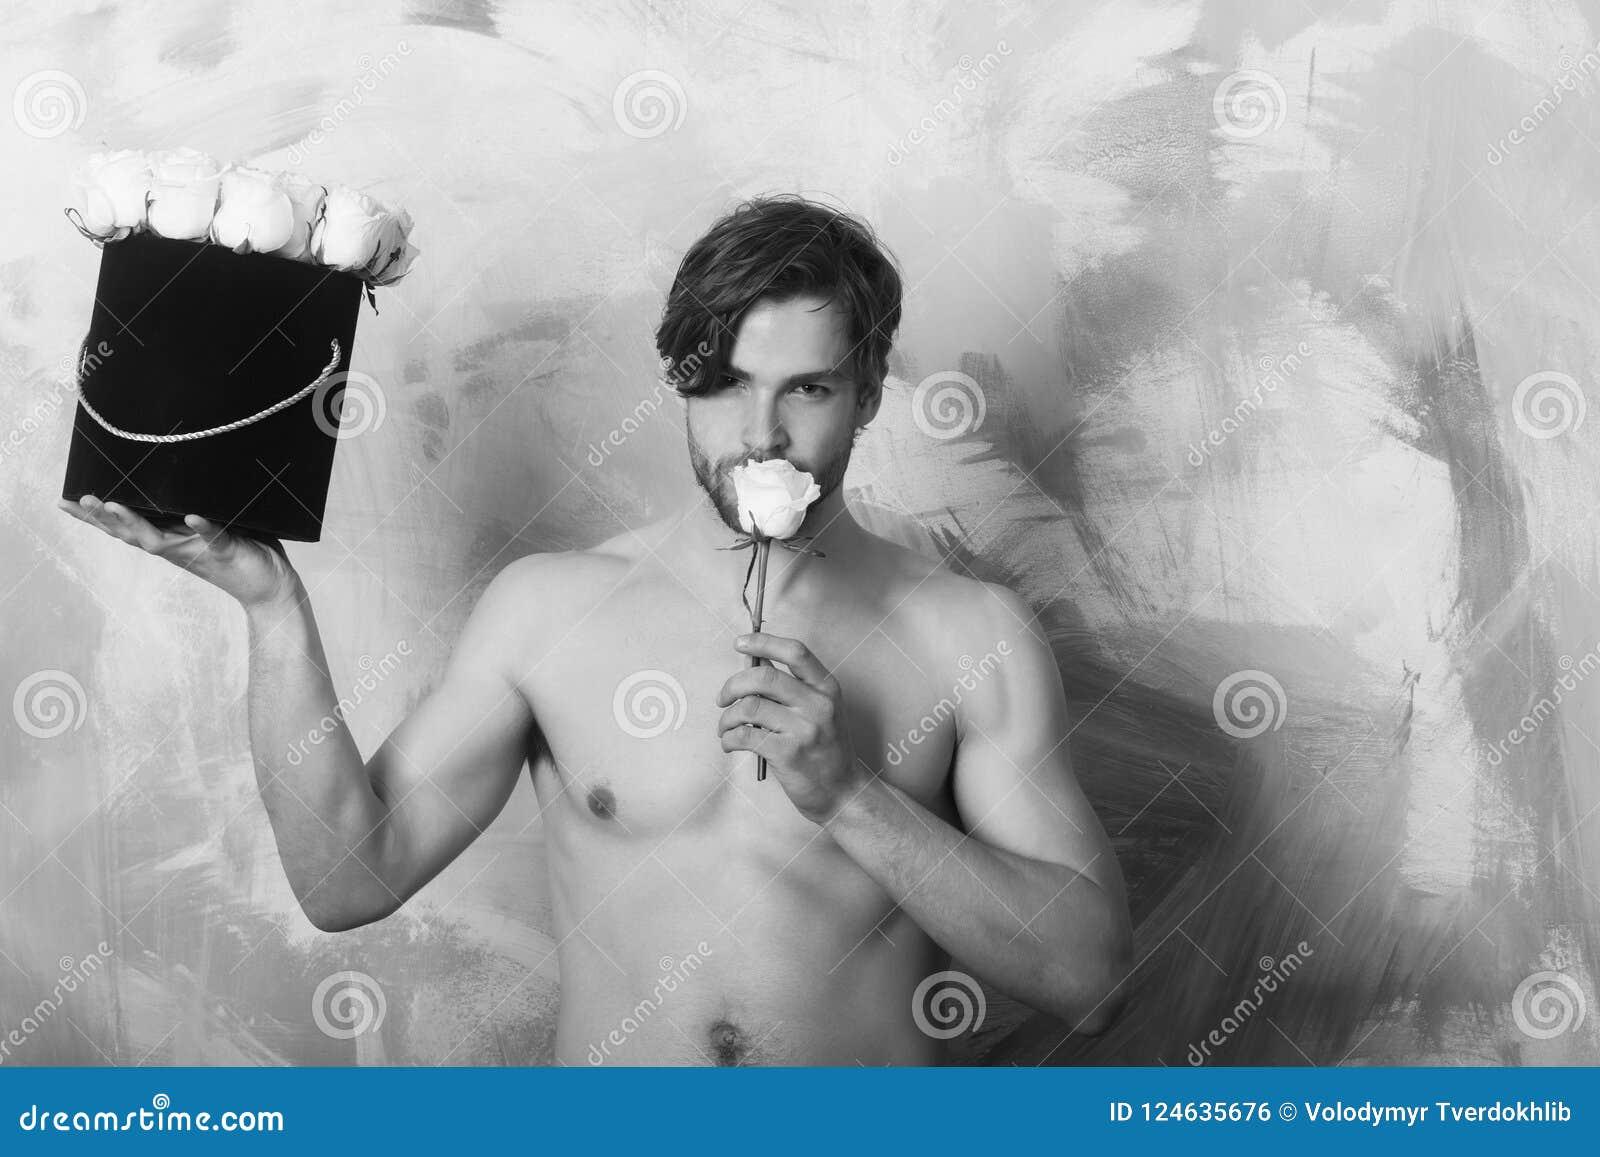 Celeb Naked White Roses HD